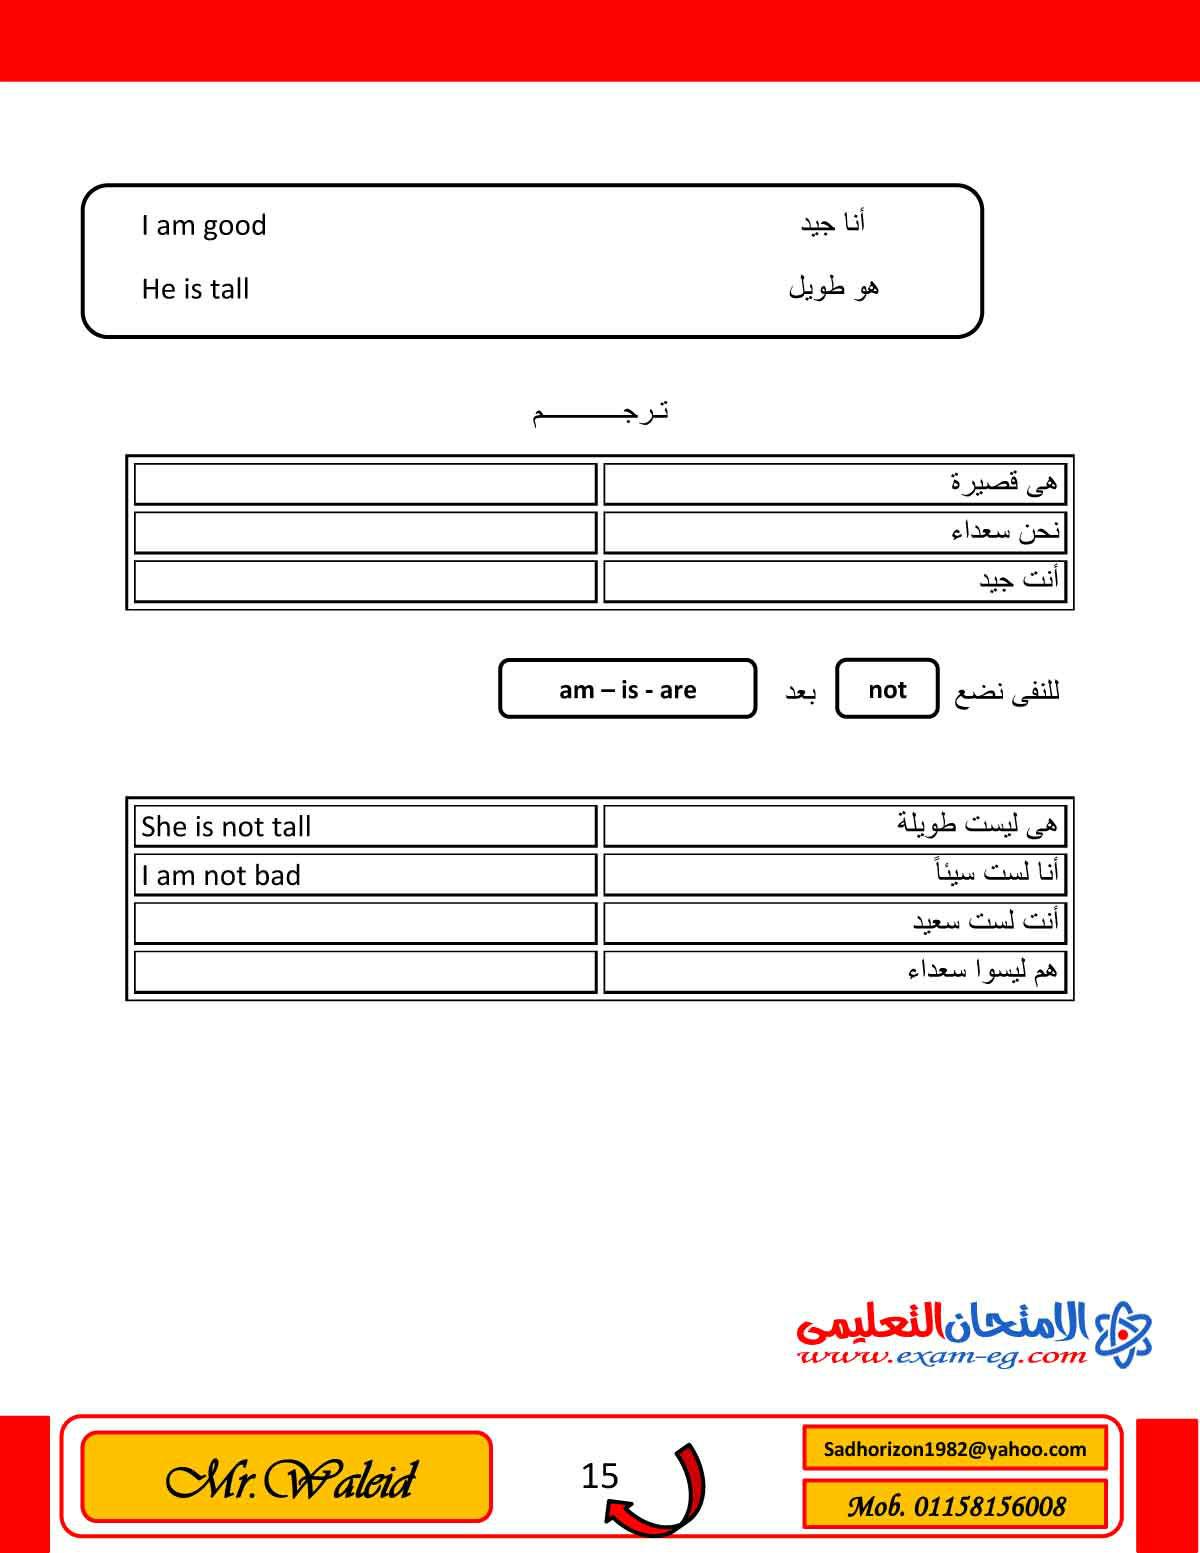 exam-eg.com_14494052437515.jpg